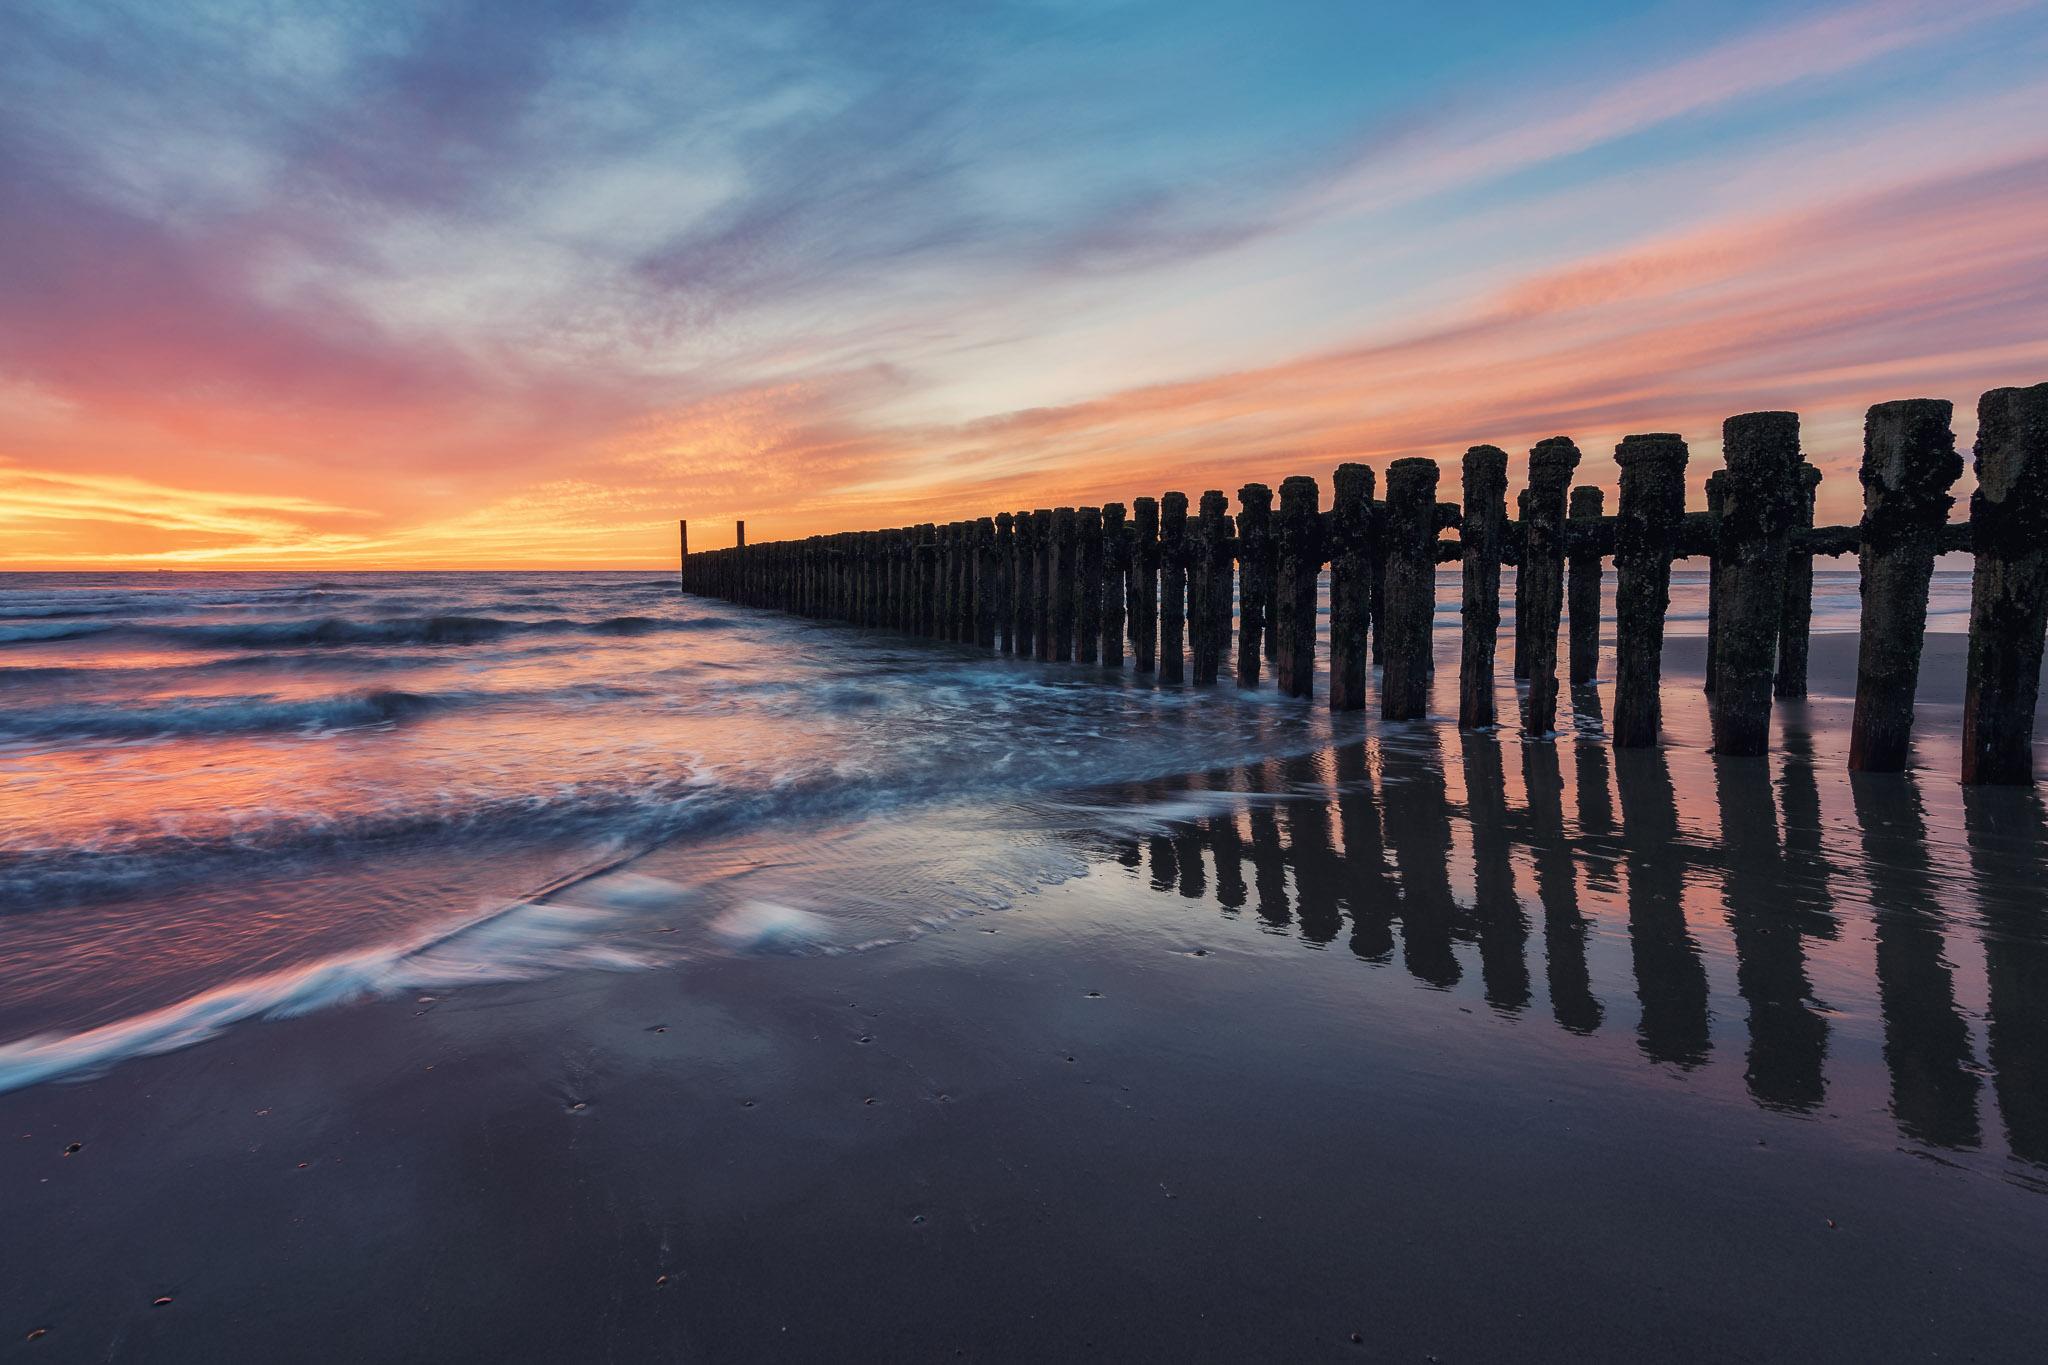 Breakwater at beach near Domburg, Netherlands